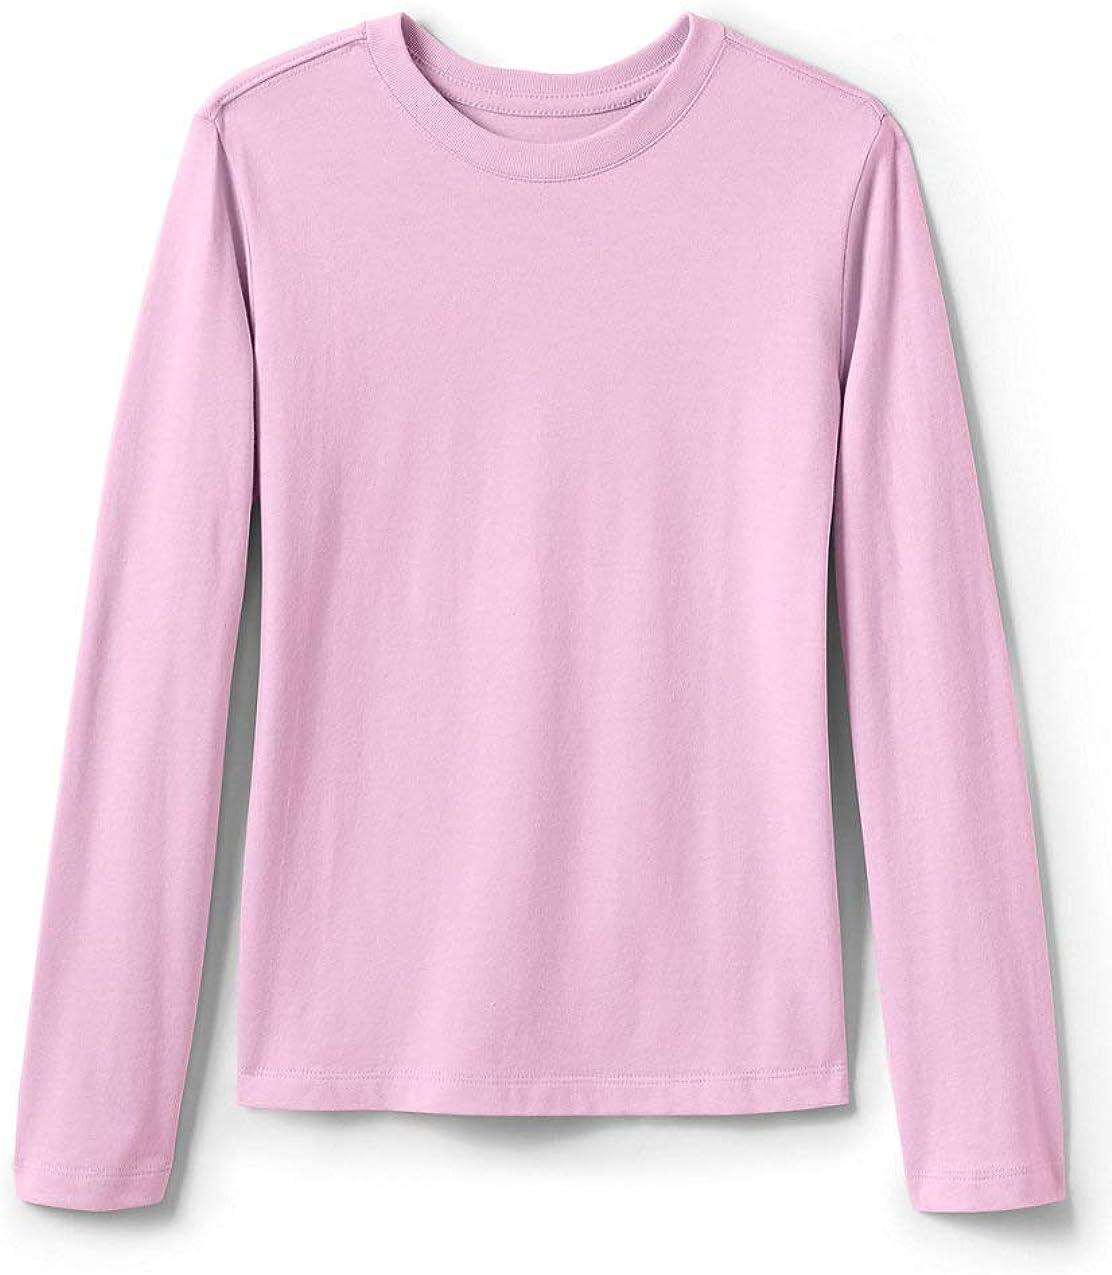 Lands' End School Uniform Girls Long Essential Atlanta Mall Spasm price Sleeve T-Shirt